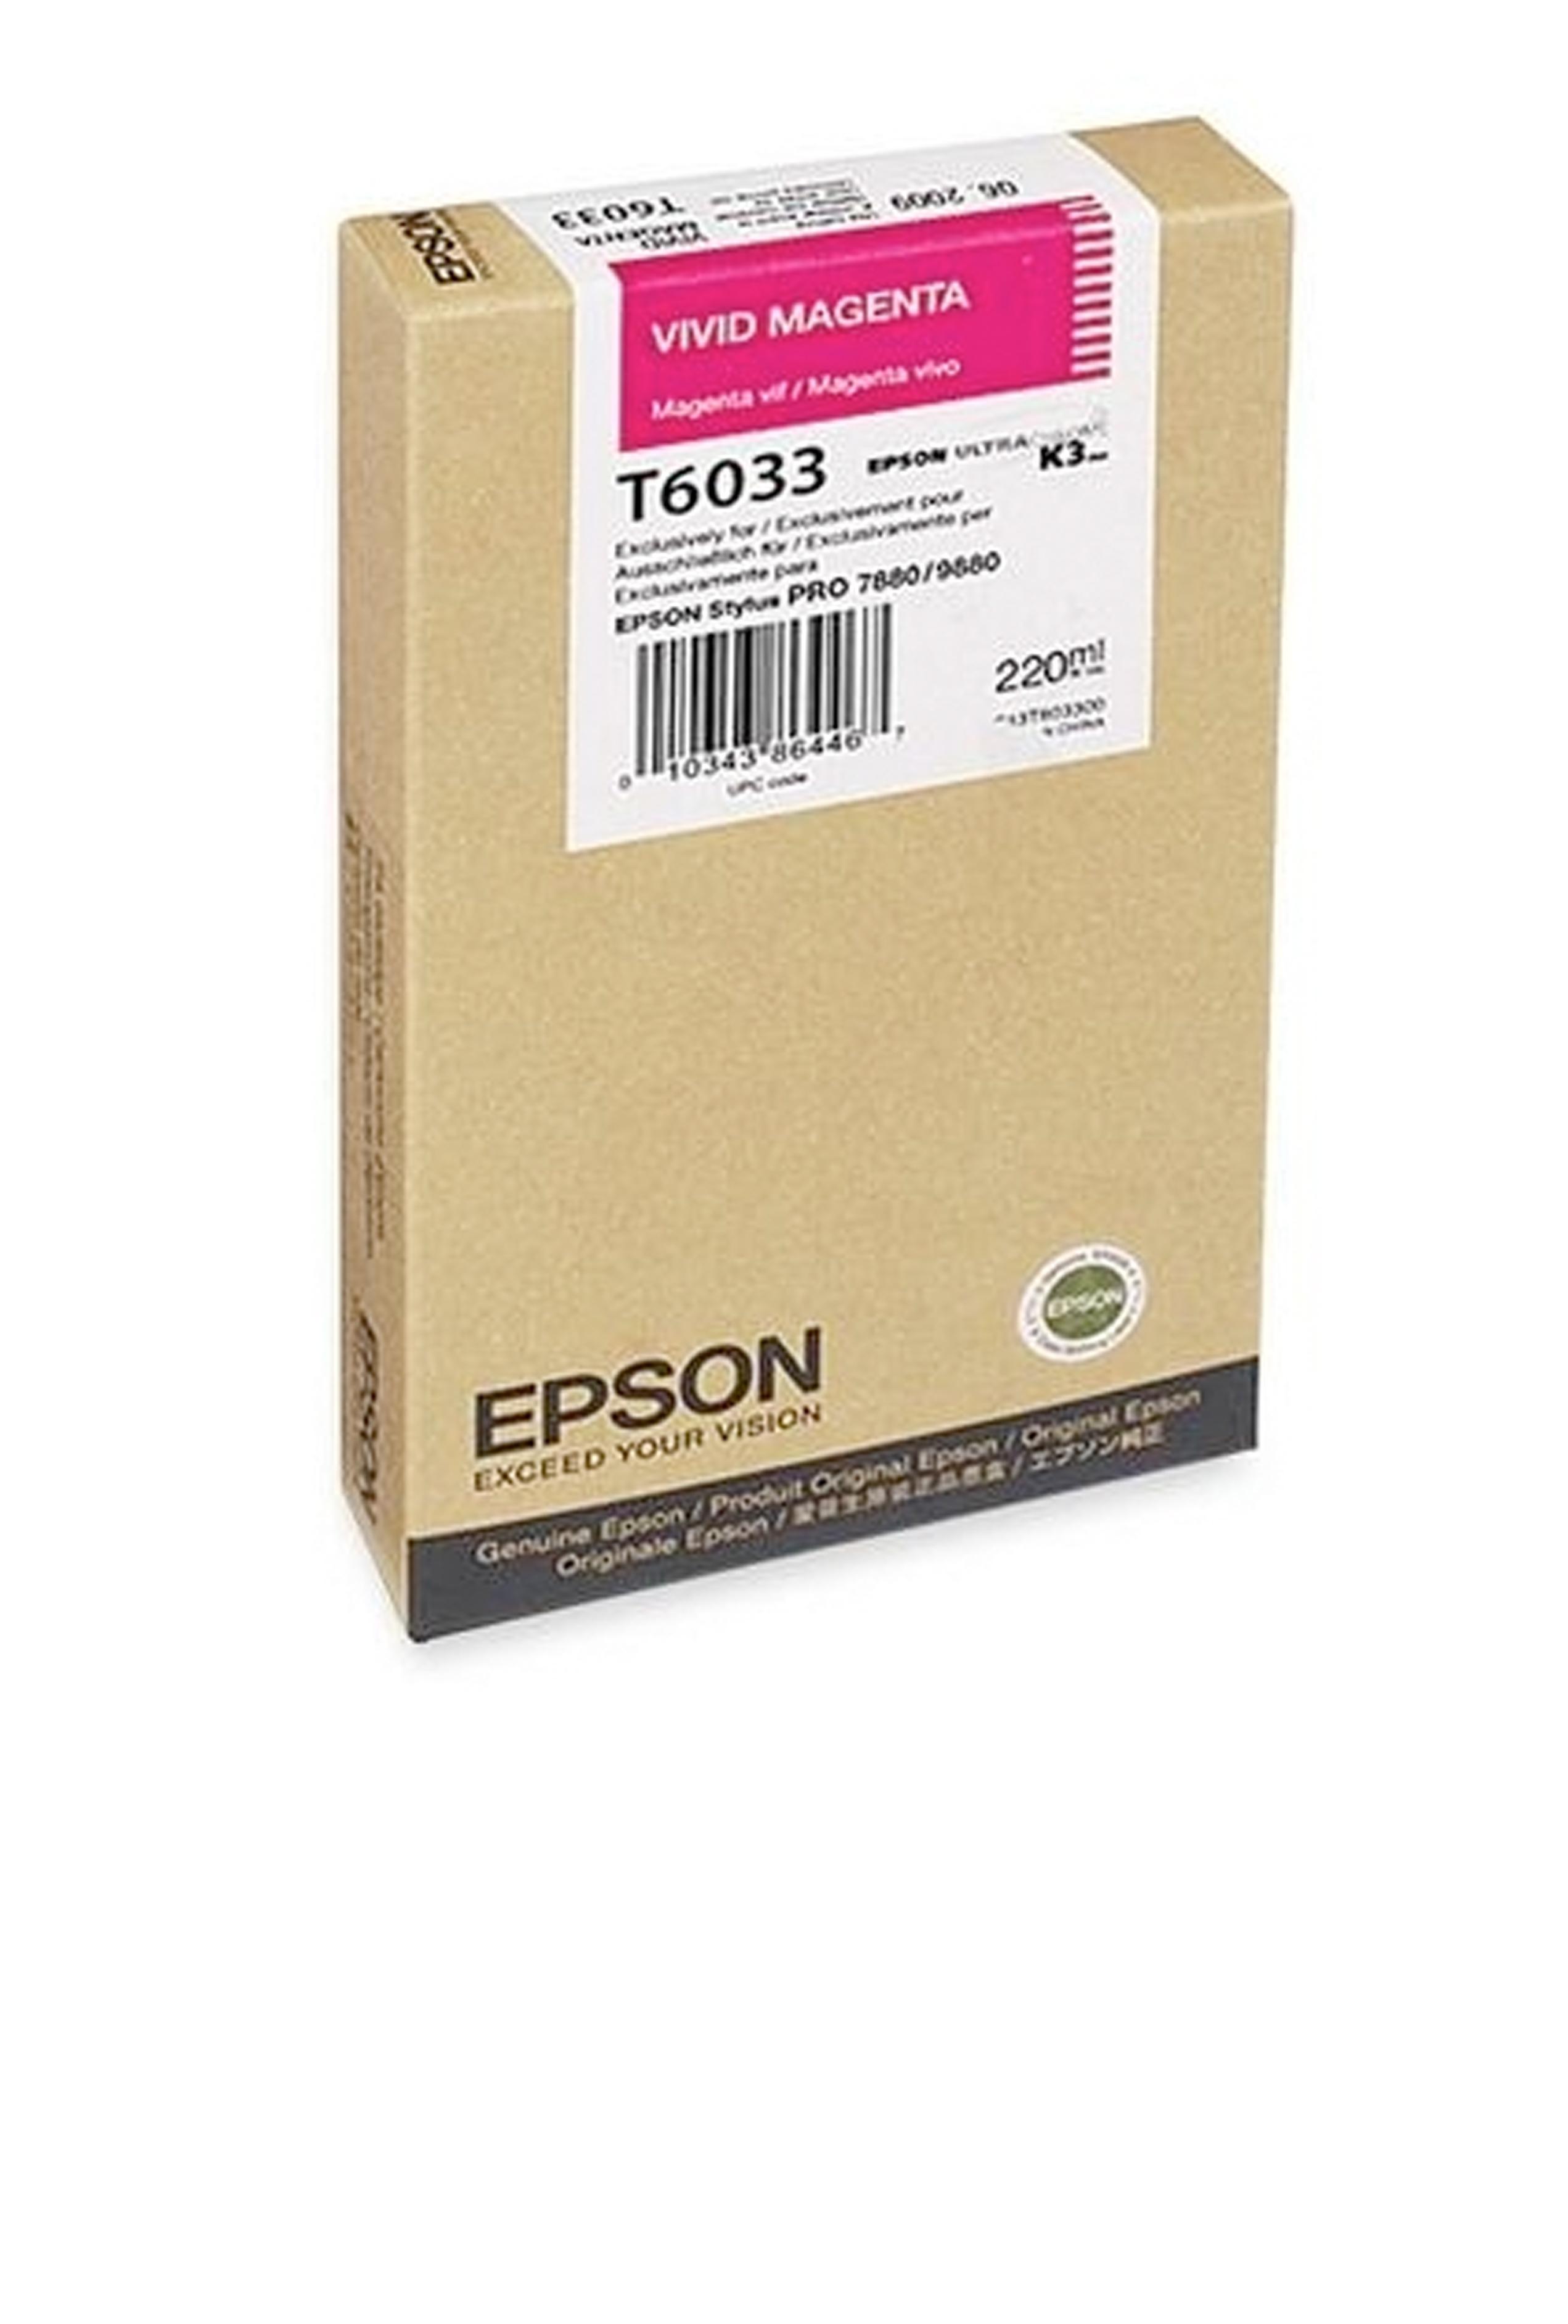 Epson EPSON SD VIVID MAGENTA INK (220 ML) (T603300)